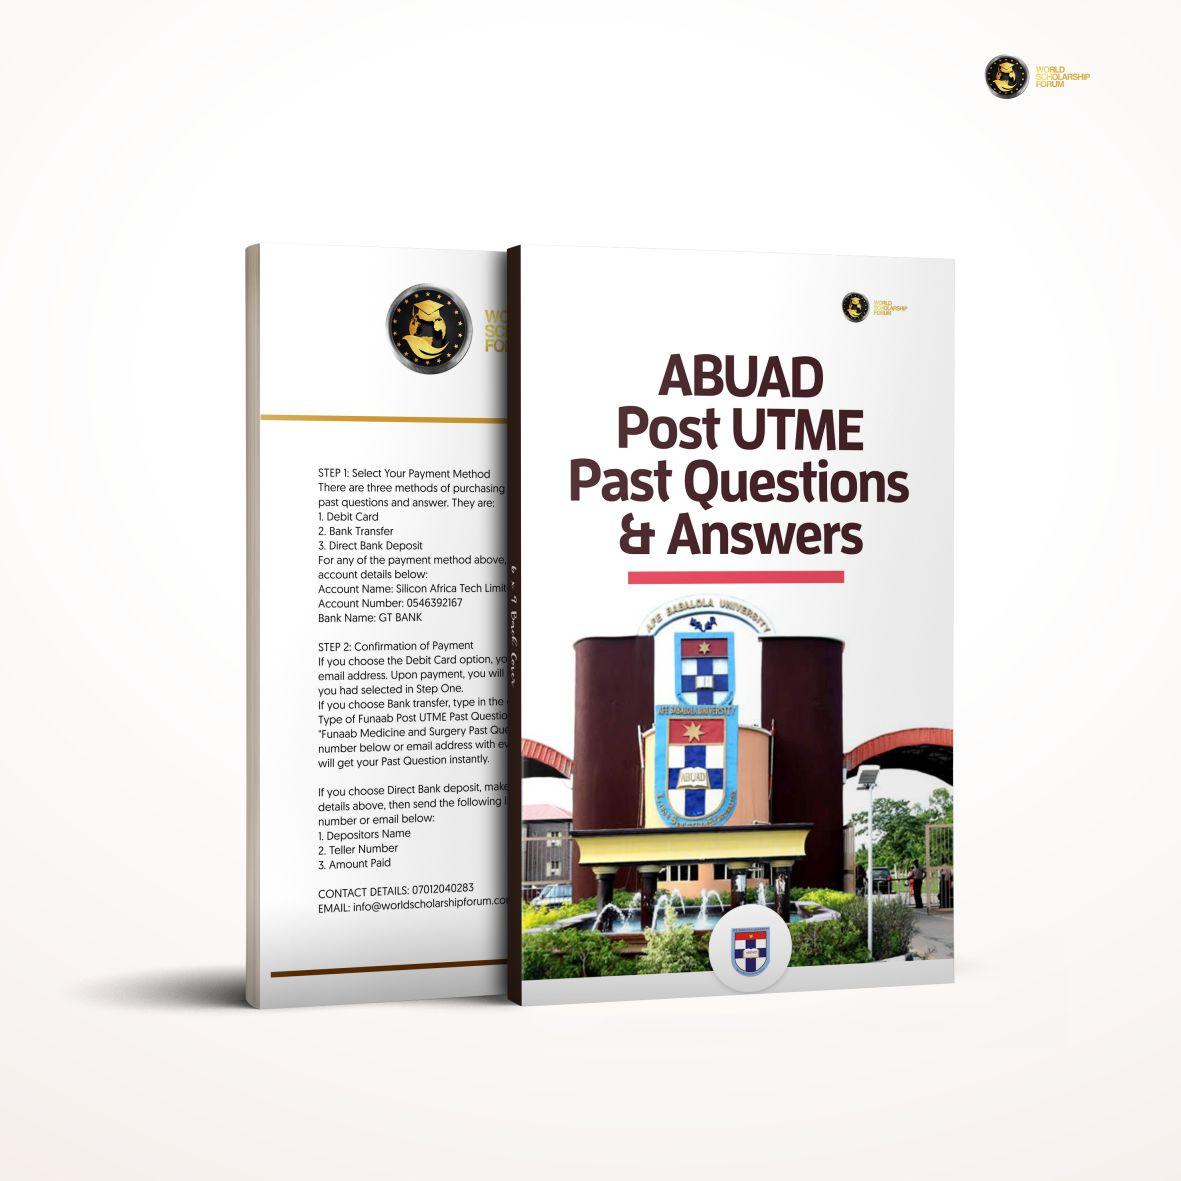 ABUAD Post Utme Past Questions